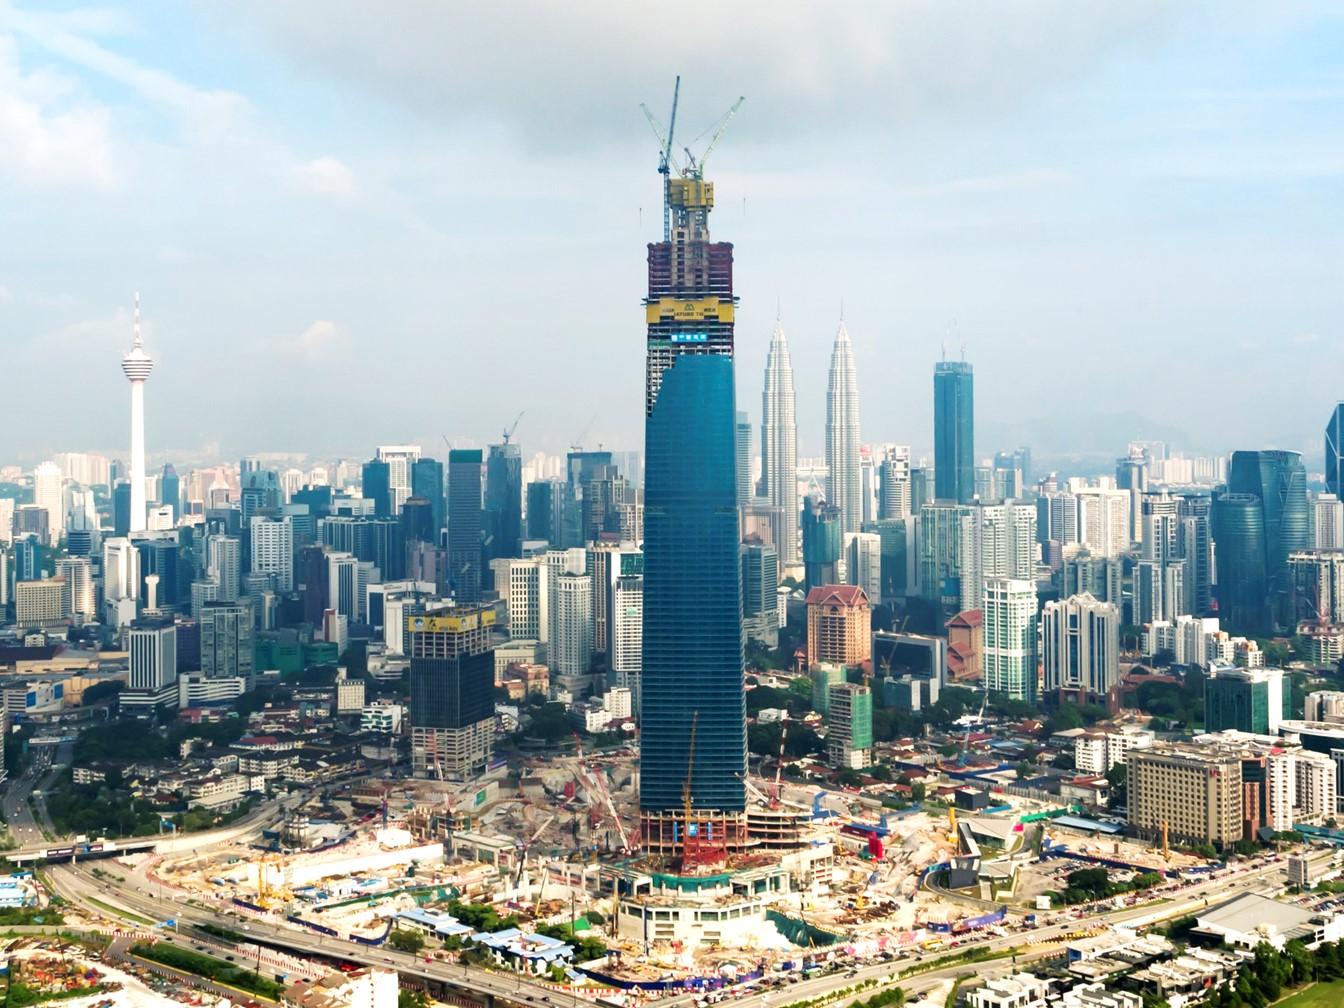 Image from Mulia Property Development Sdn Bhd